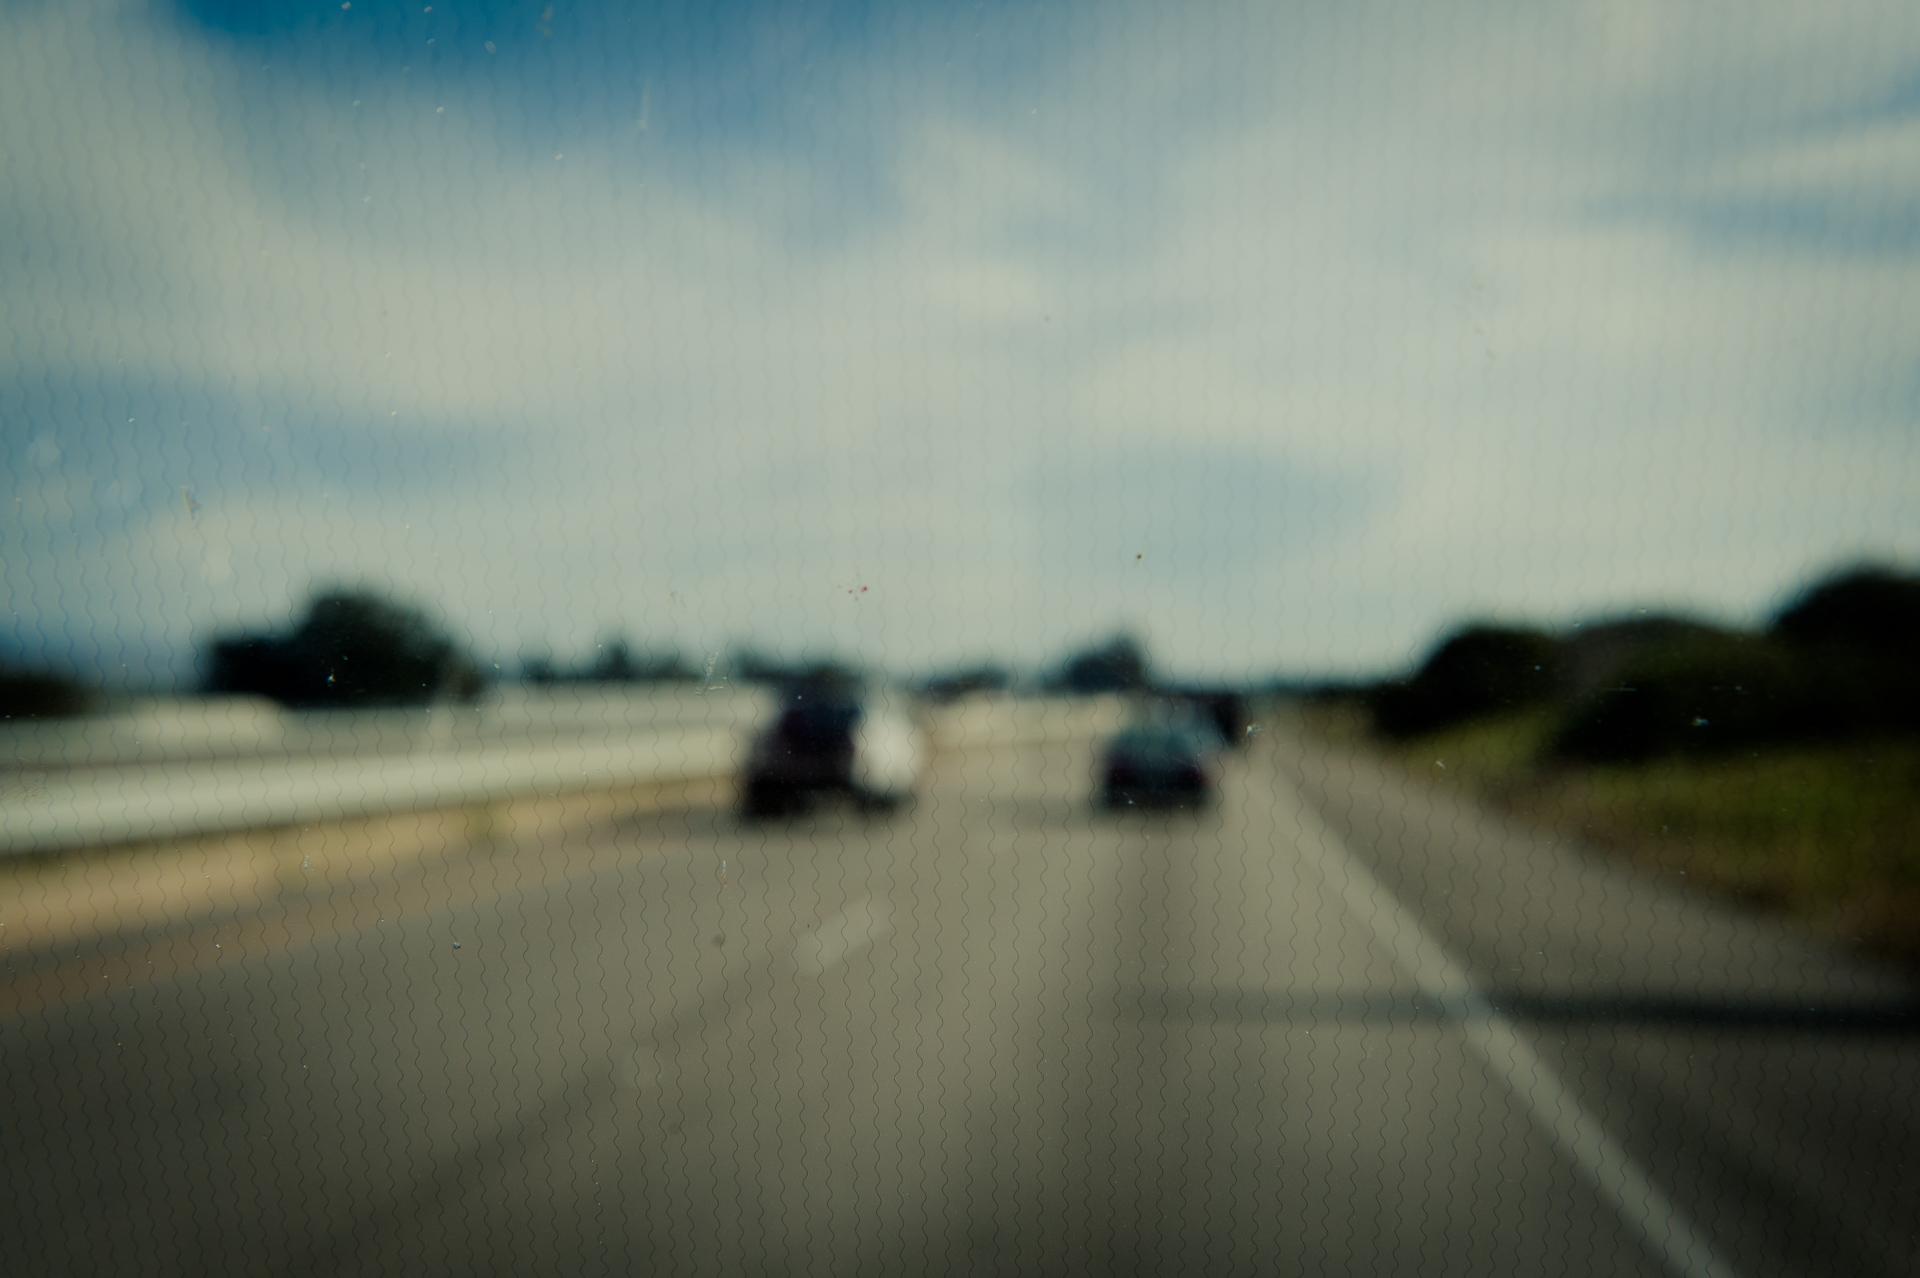 2014-Mercedes-Benz-G500-G550-braun-Kalifornien-mbrt14-16